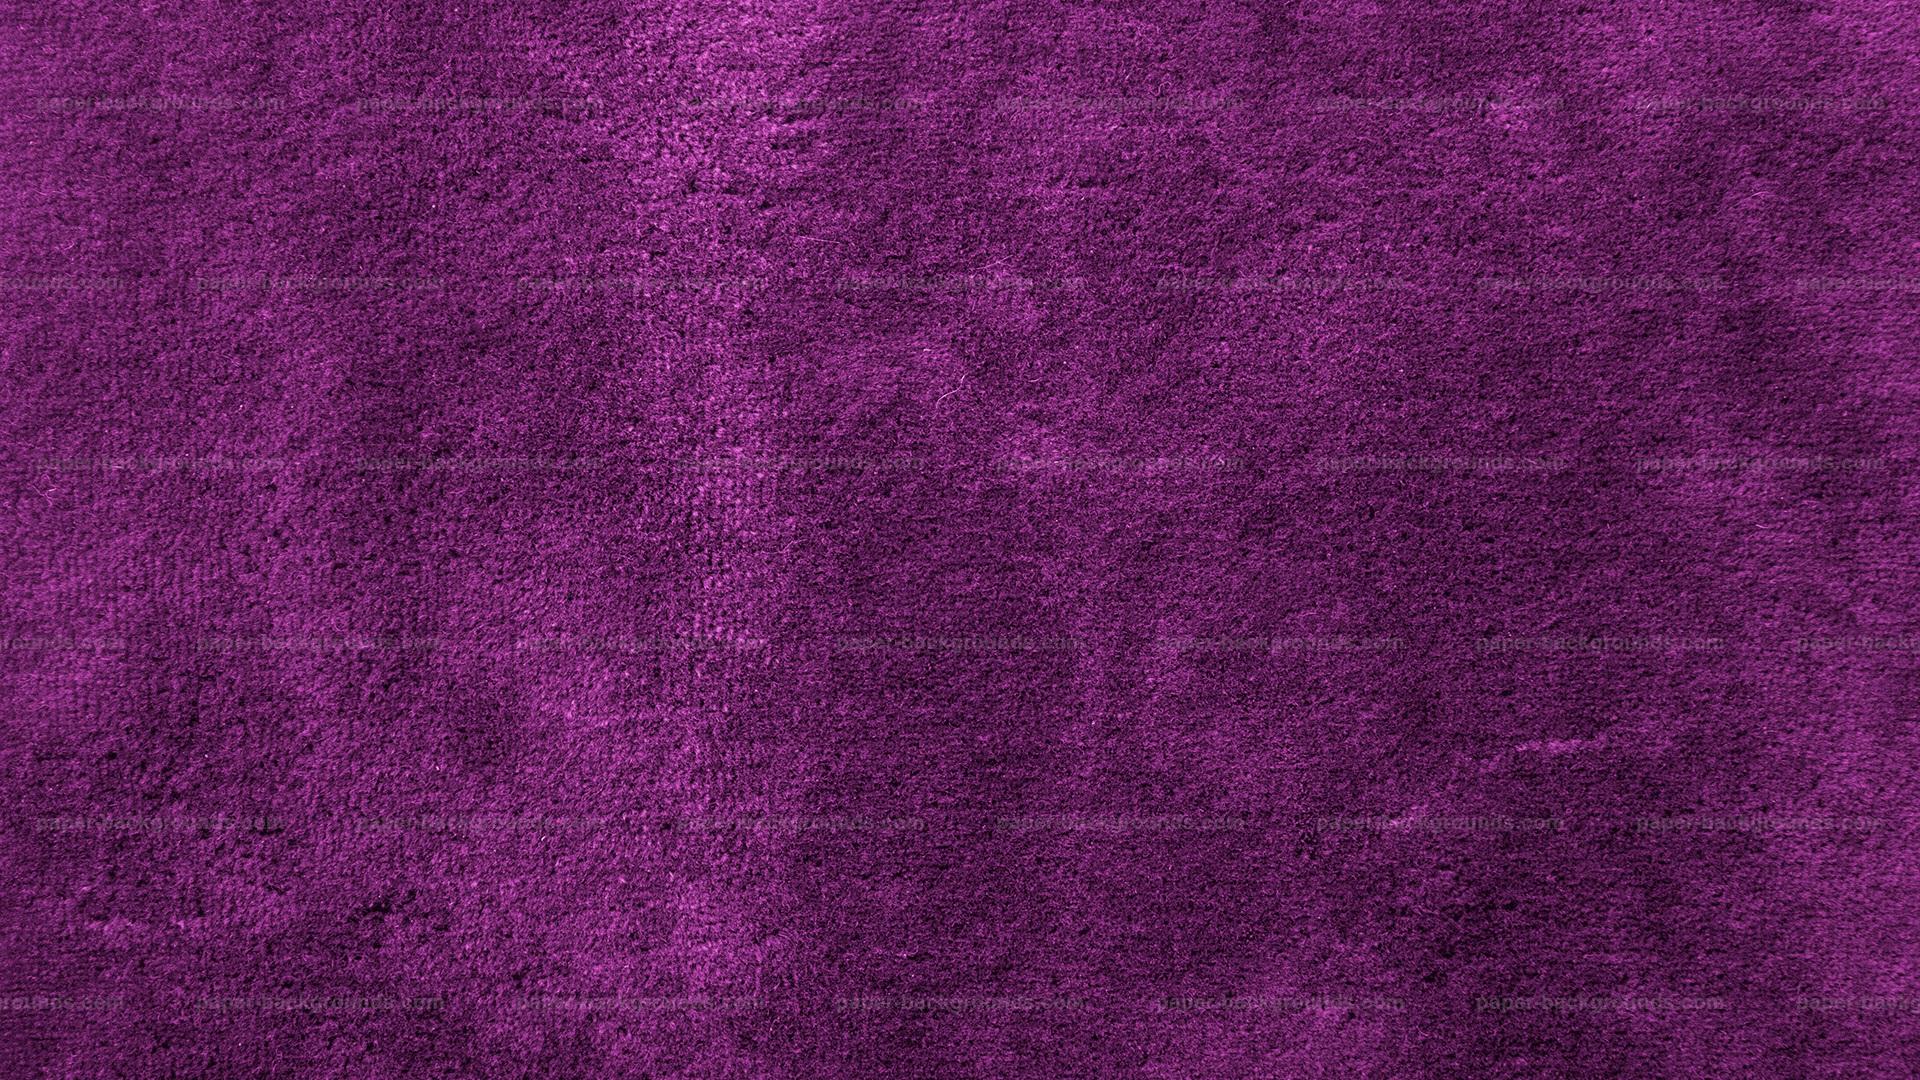 Purple Velvet Texture Background HD Paper Backgrounds 1920x1080